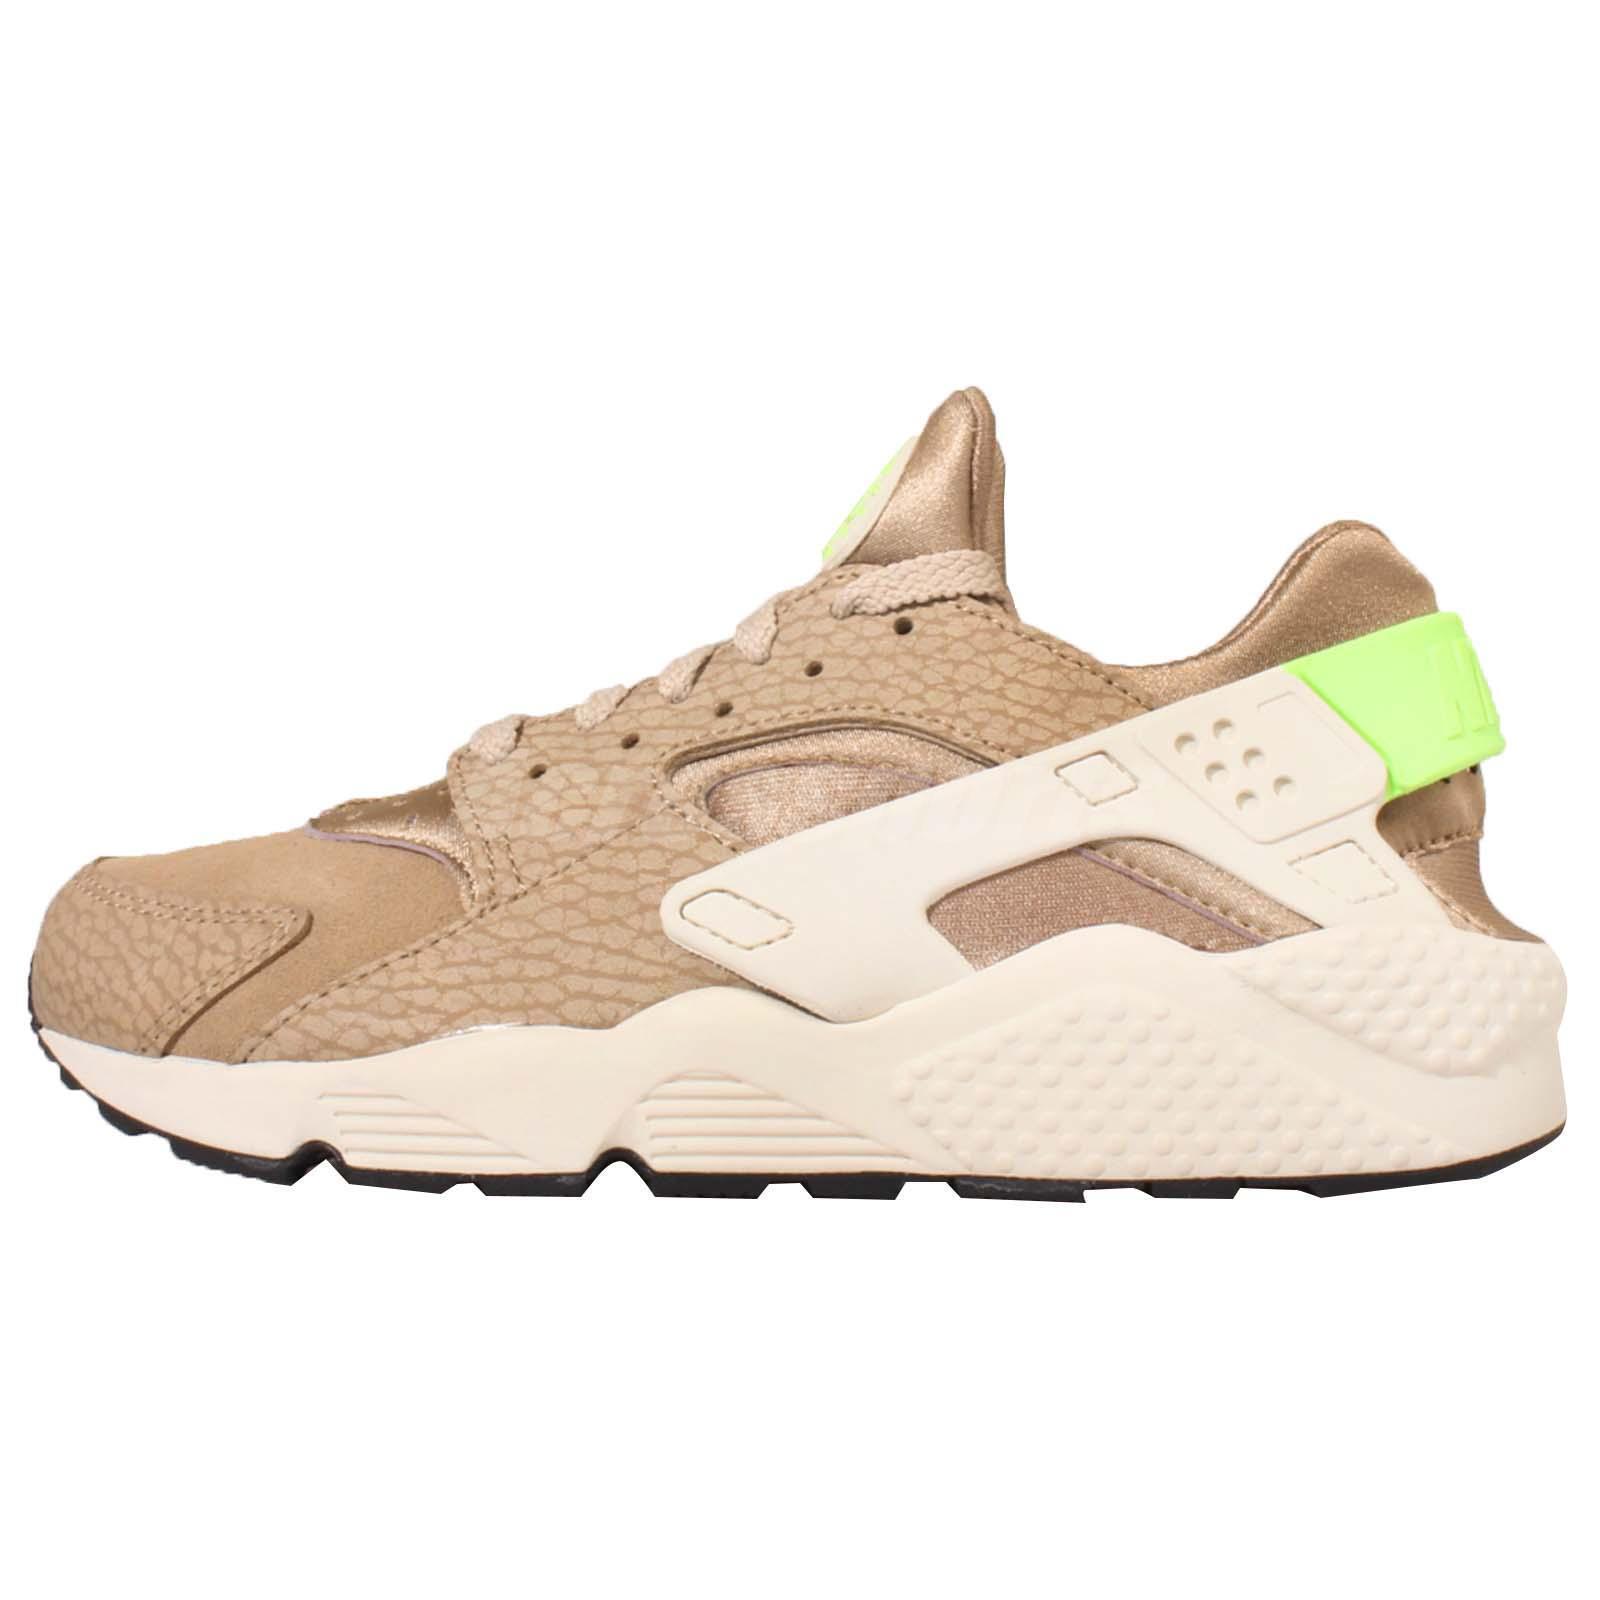 huge discount edad4 ded9b low-cost Nike Air Huarache Run PRM Premium Desert Camo Mens Running Shoes  704830-203